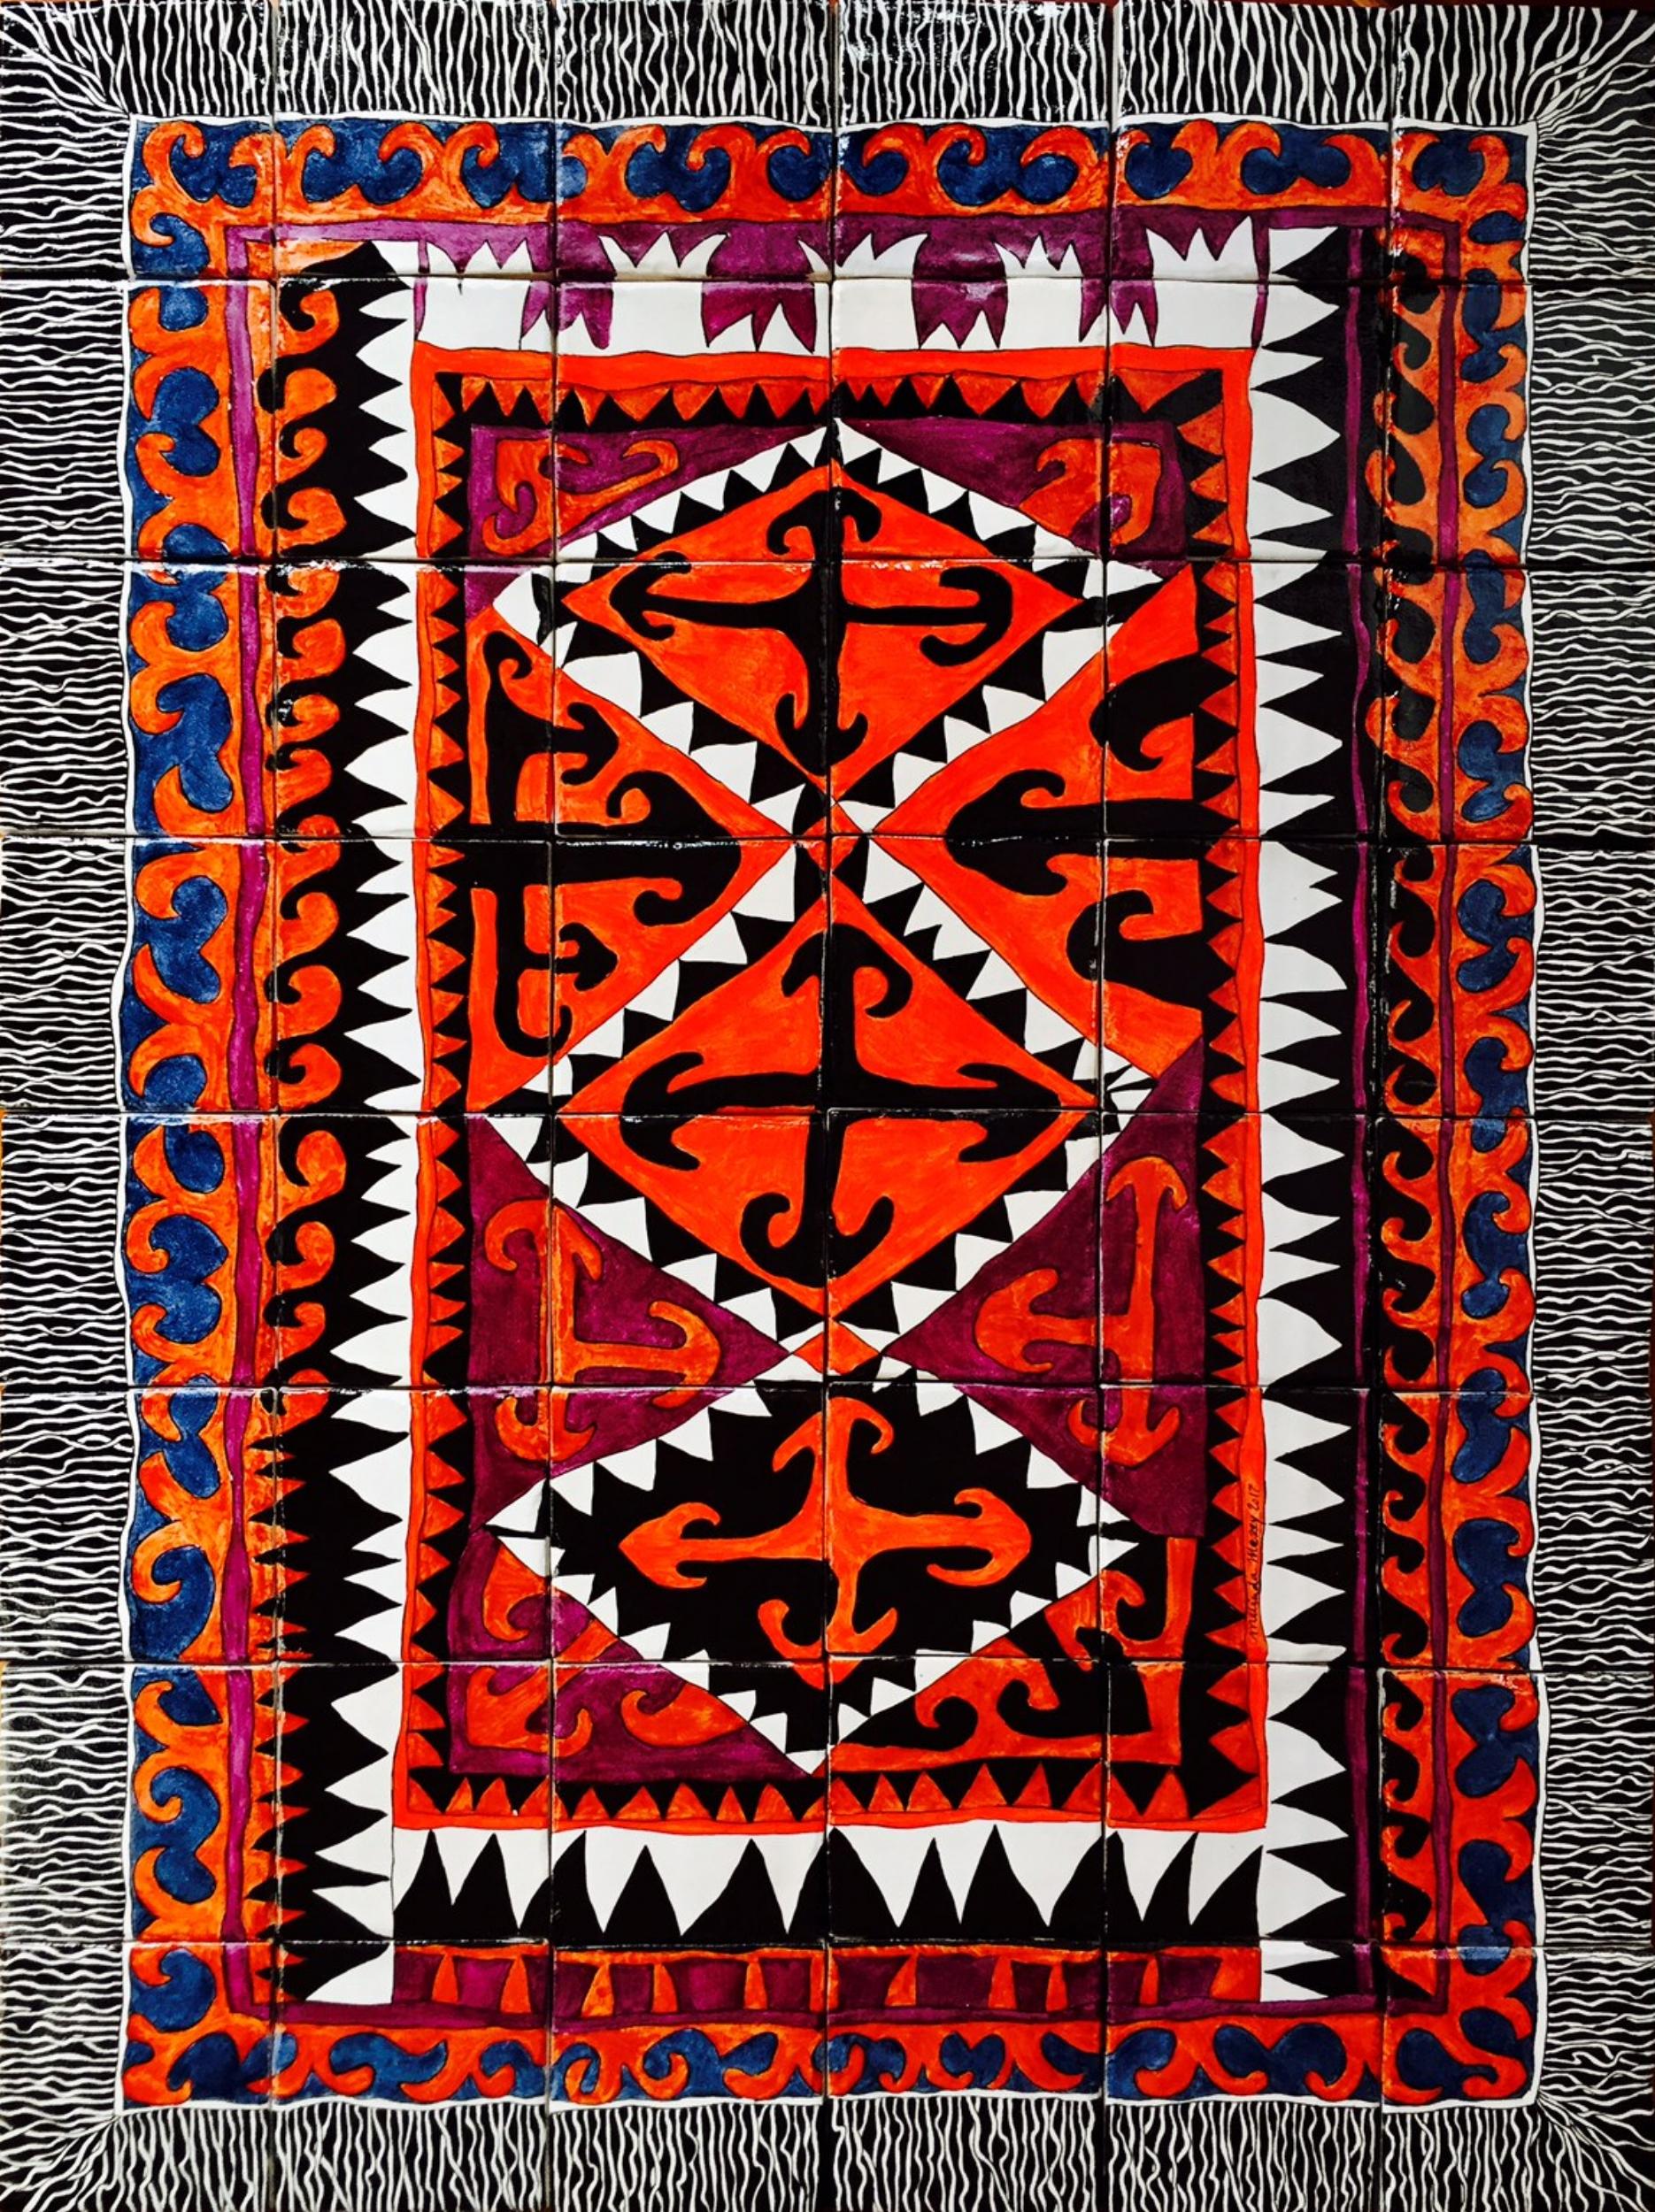 Central Asian Carpet Design  - 12 x 16 in, 30 x 40 cm